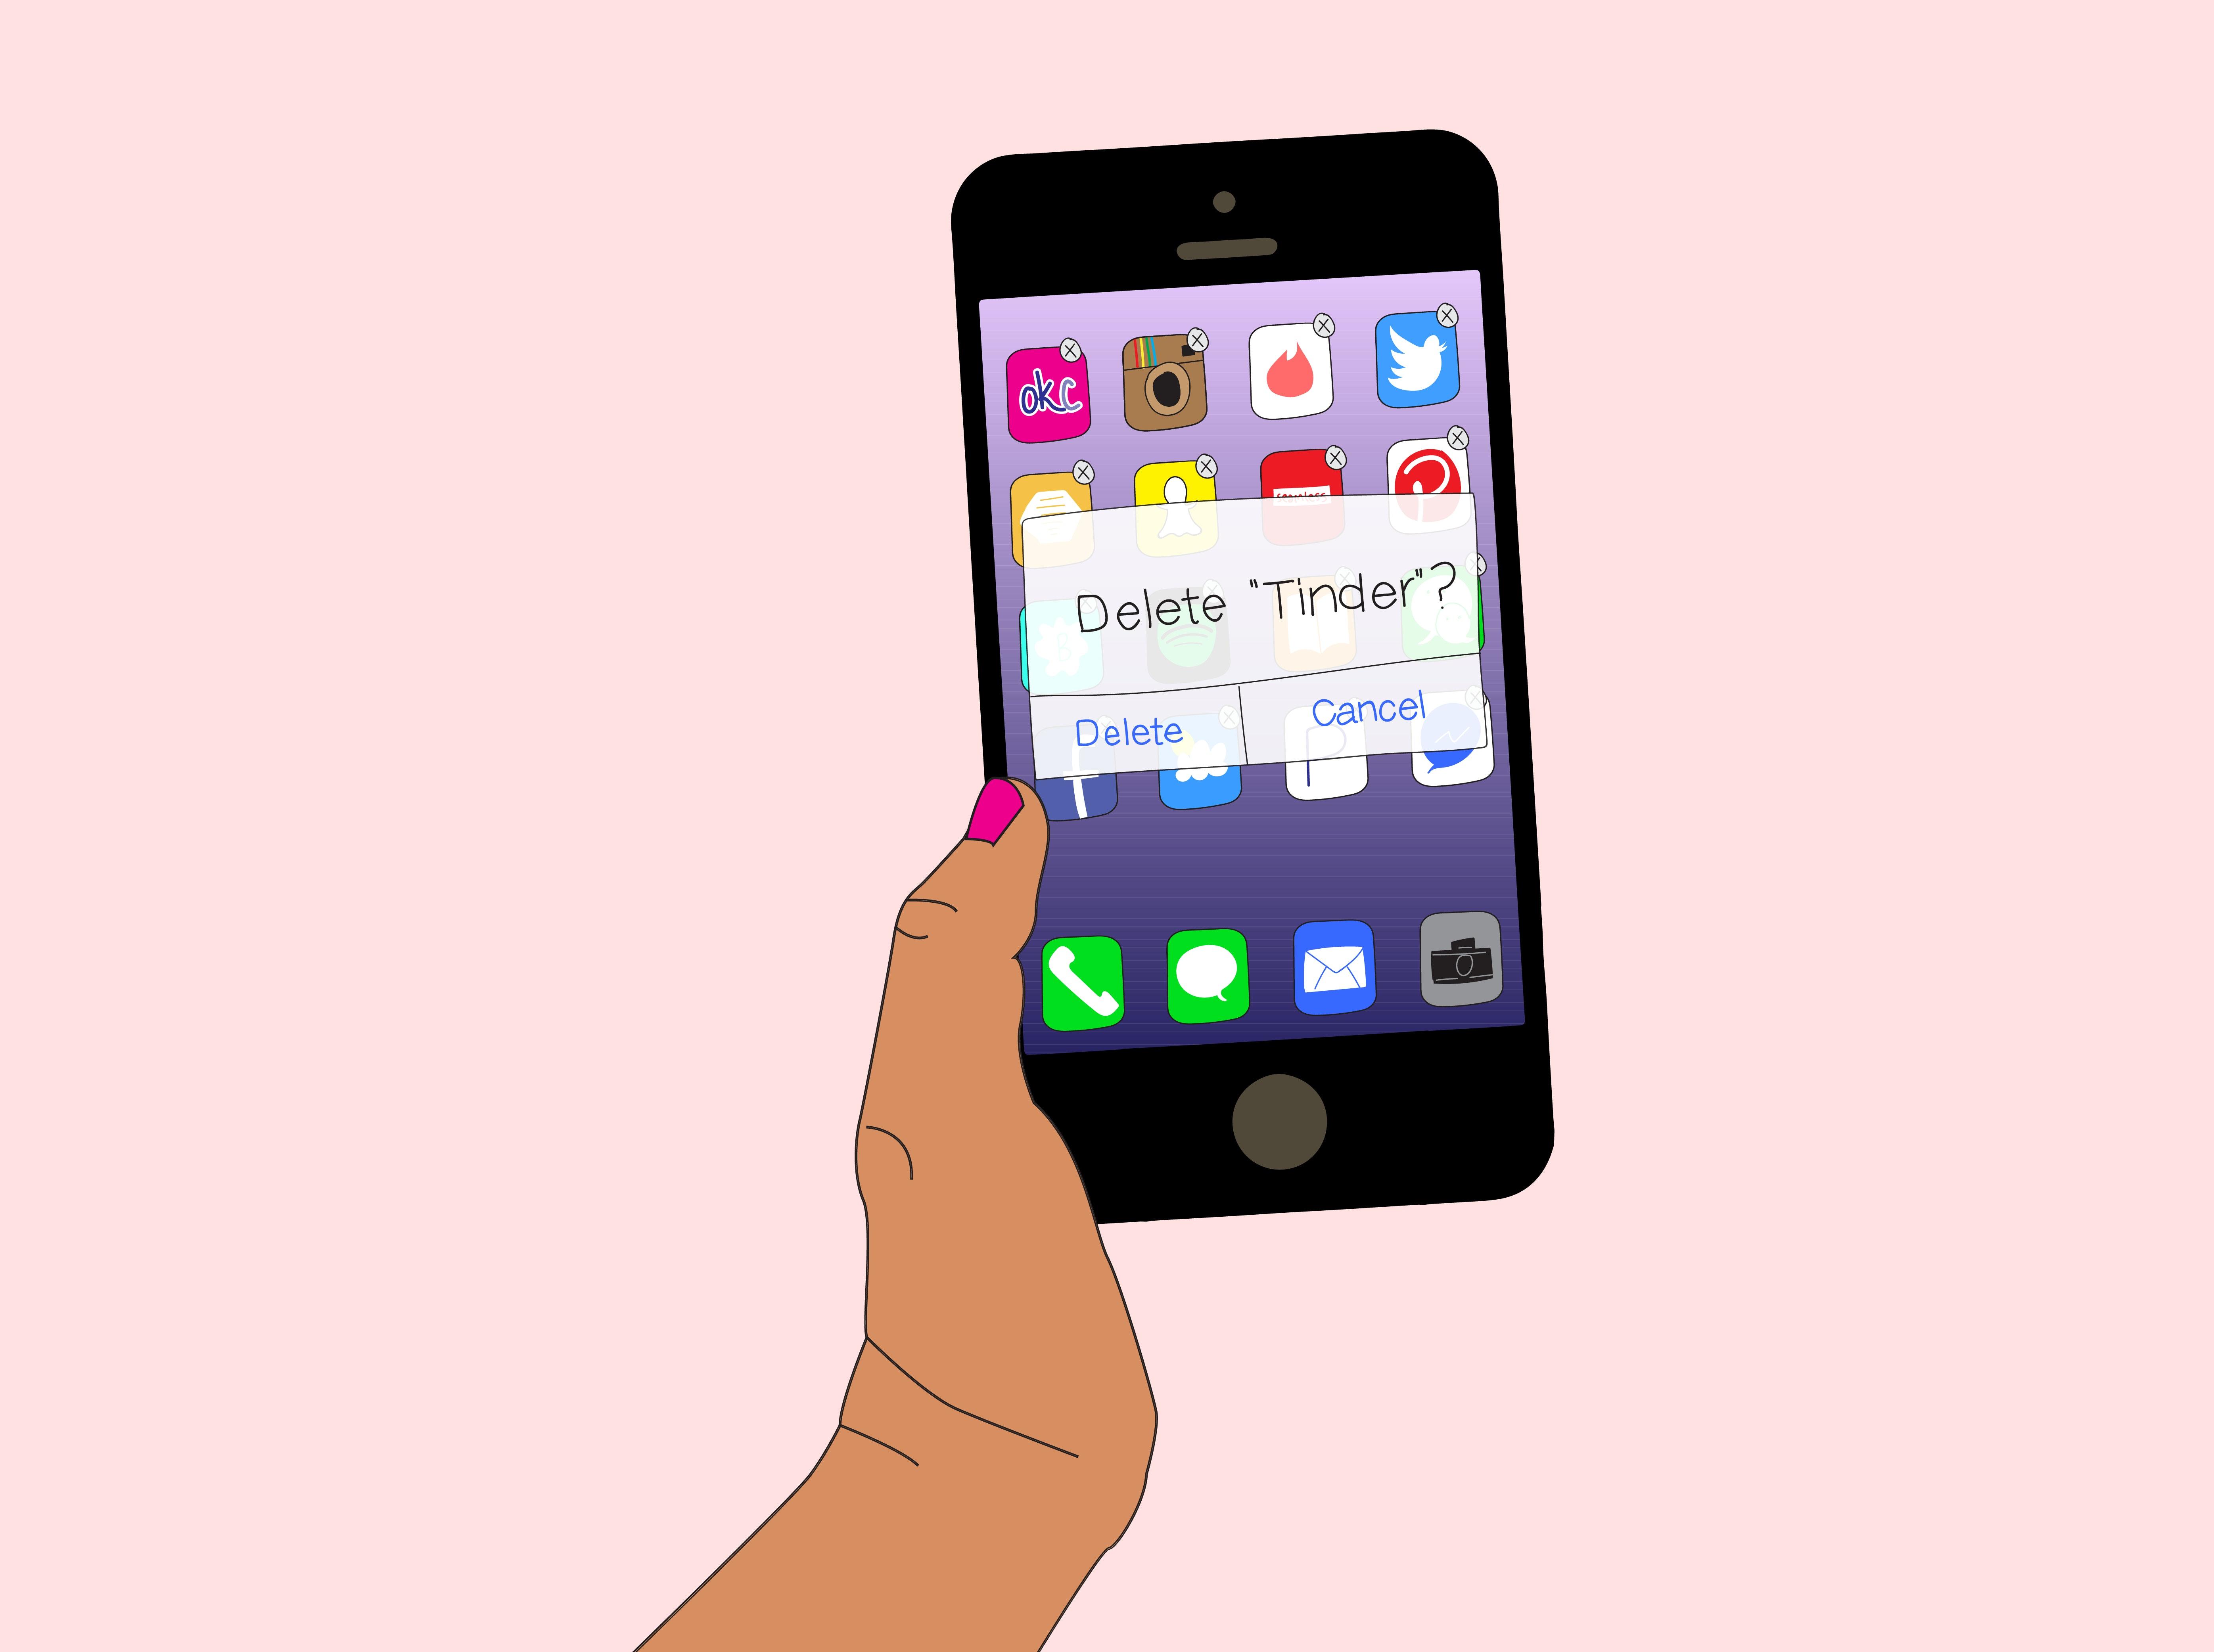 flirt and hook up delete